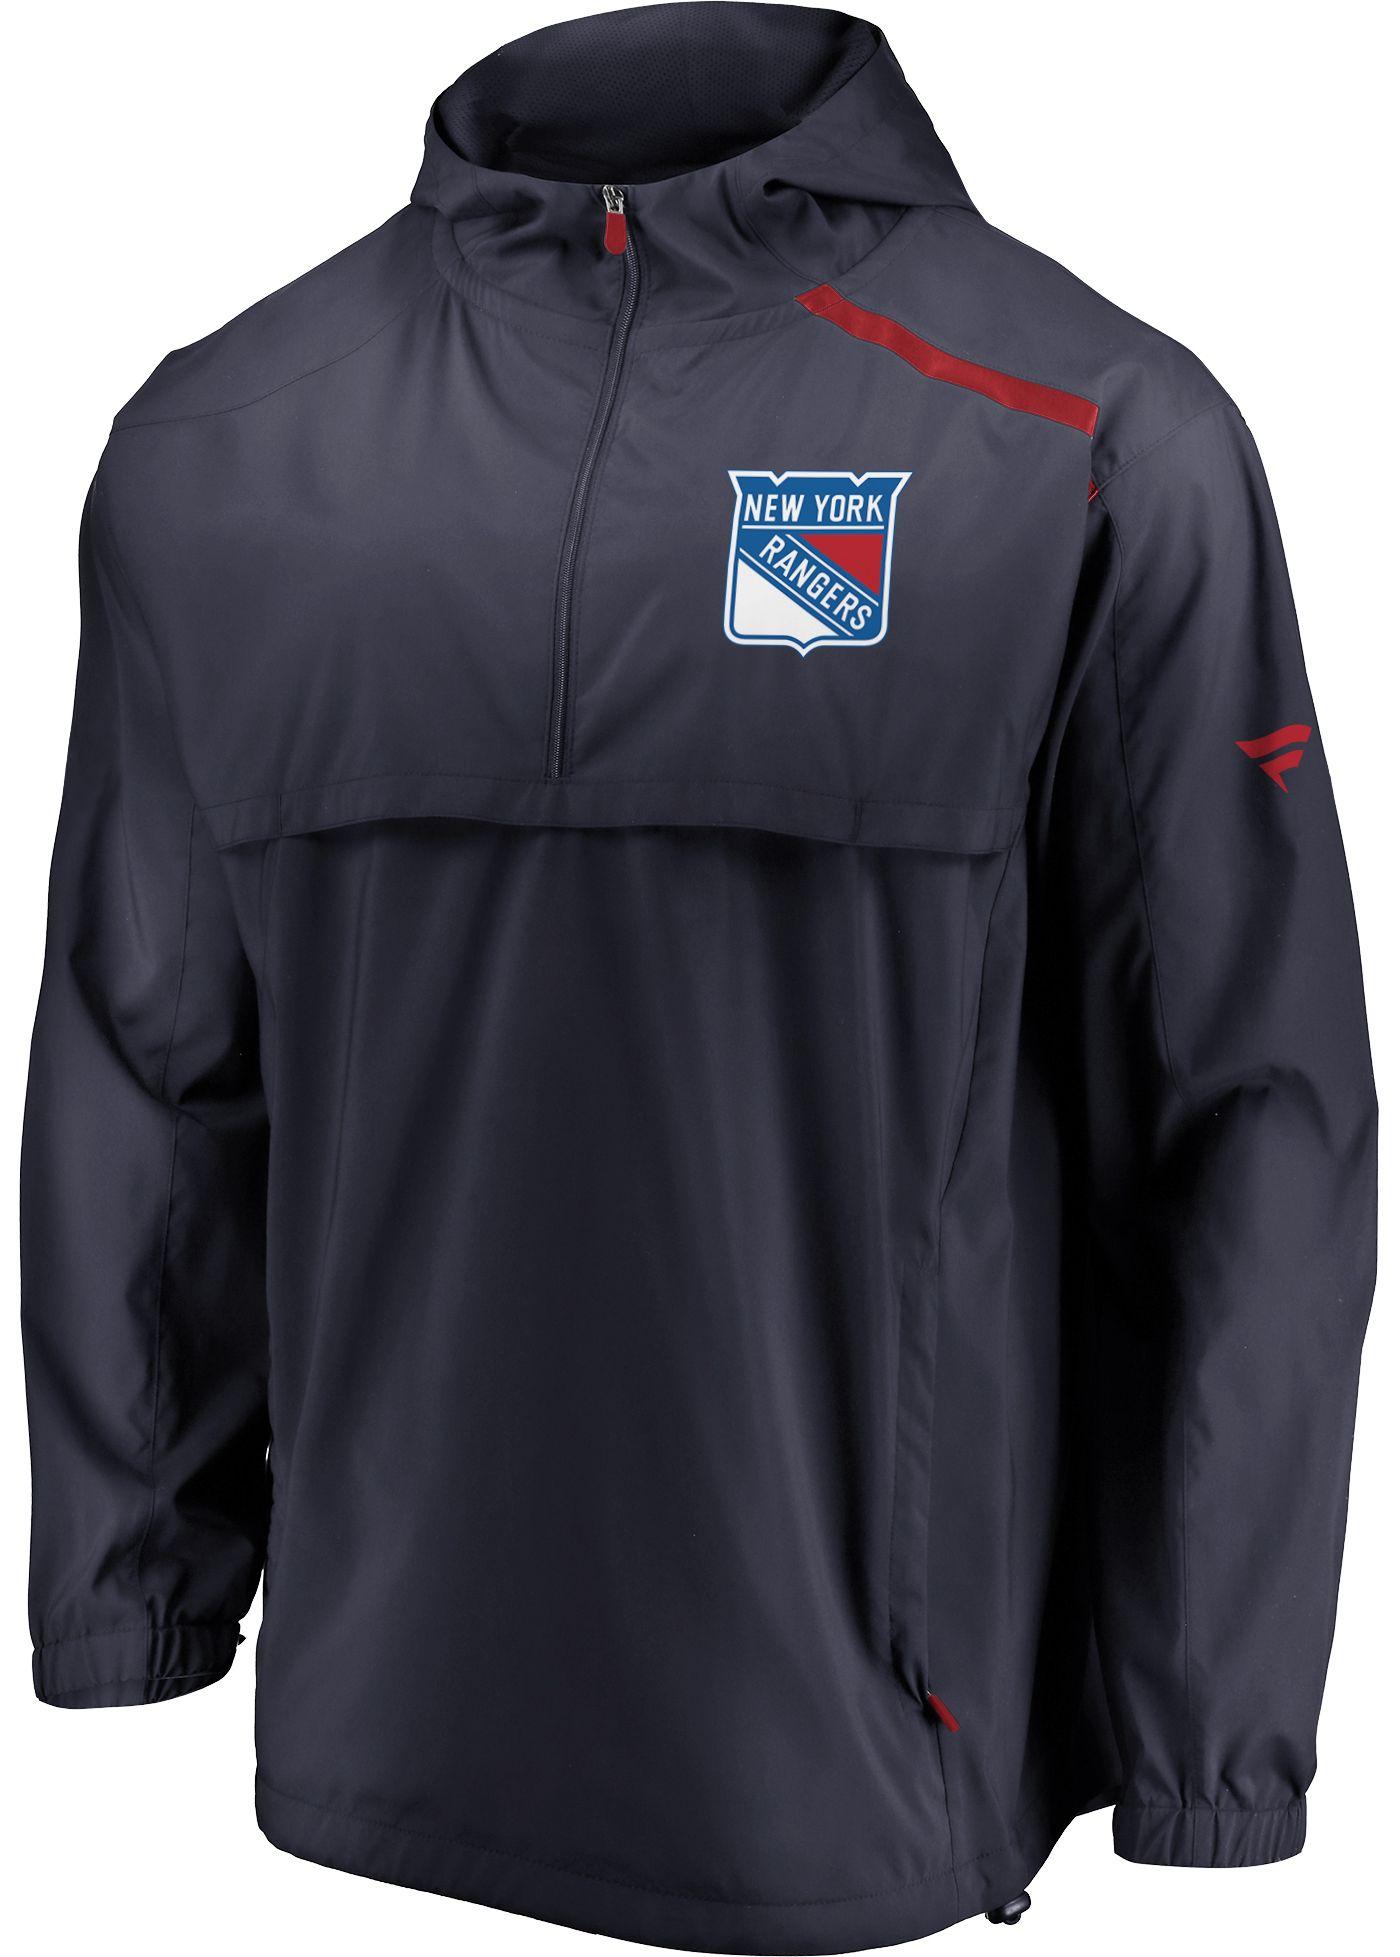 NHL Men's New York Rangers Authentic Pro Navy Anorak Jacket